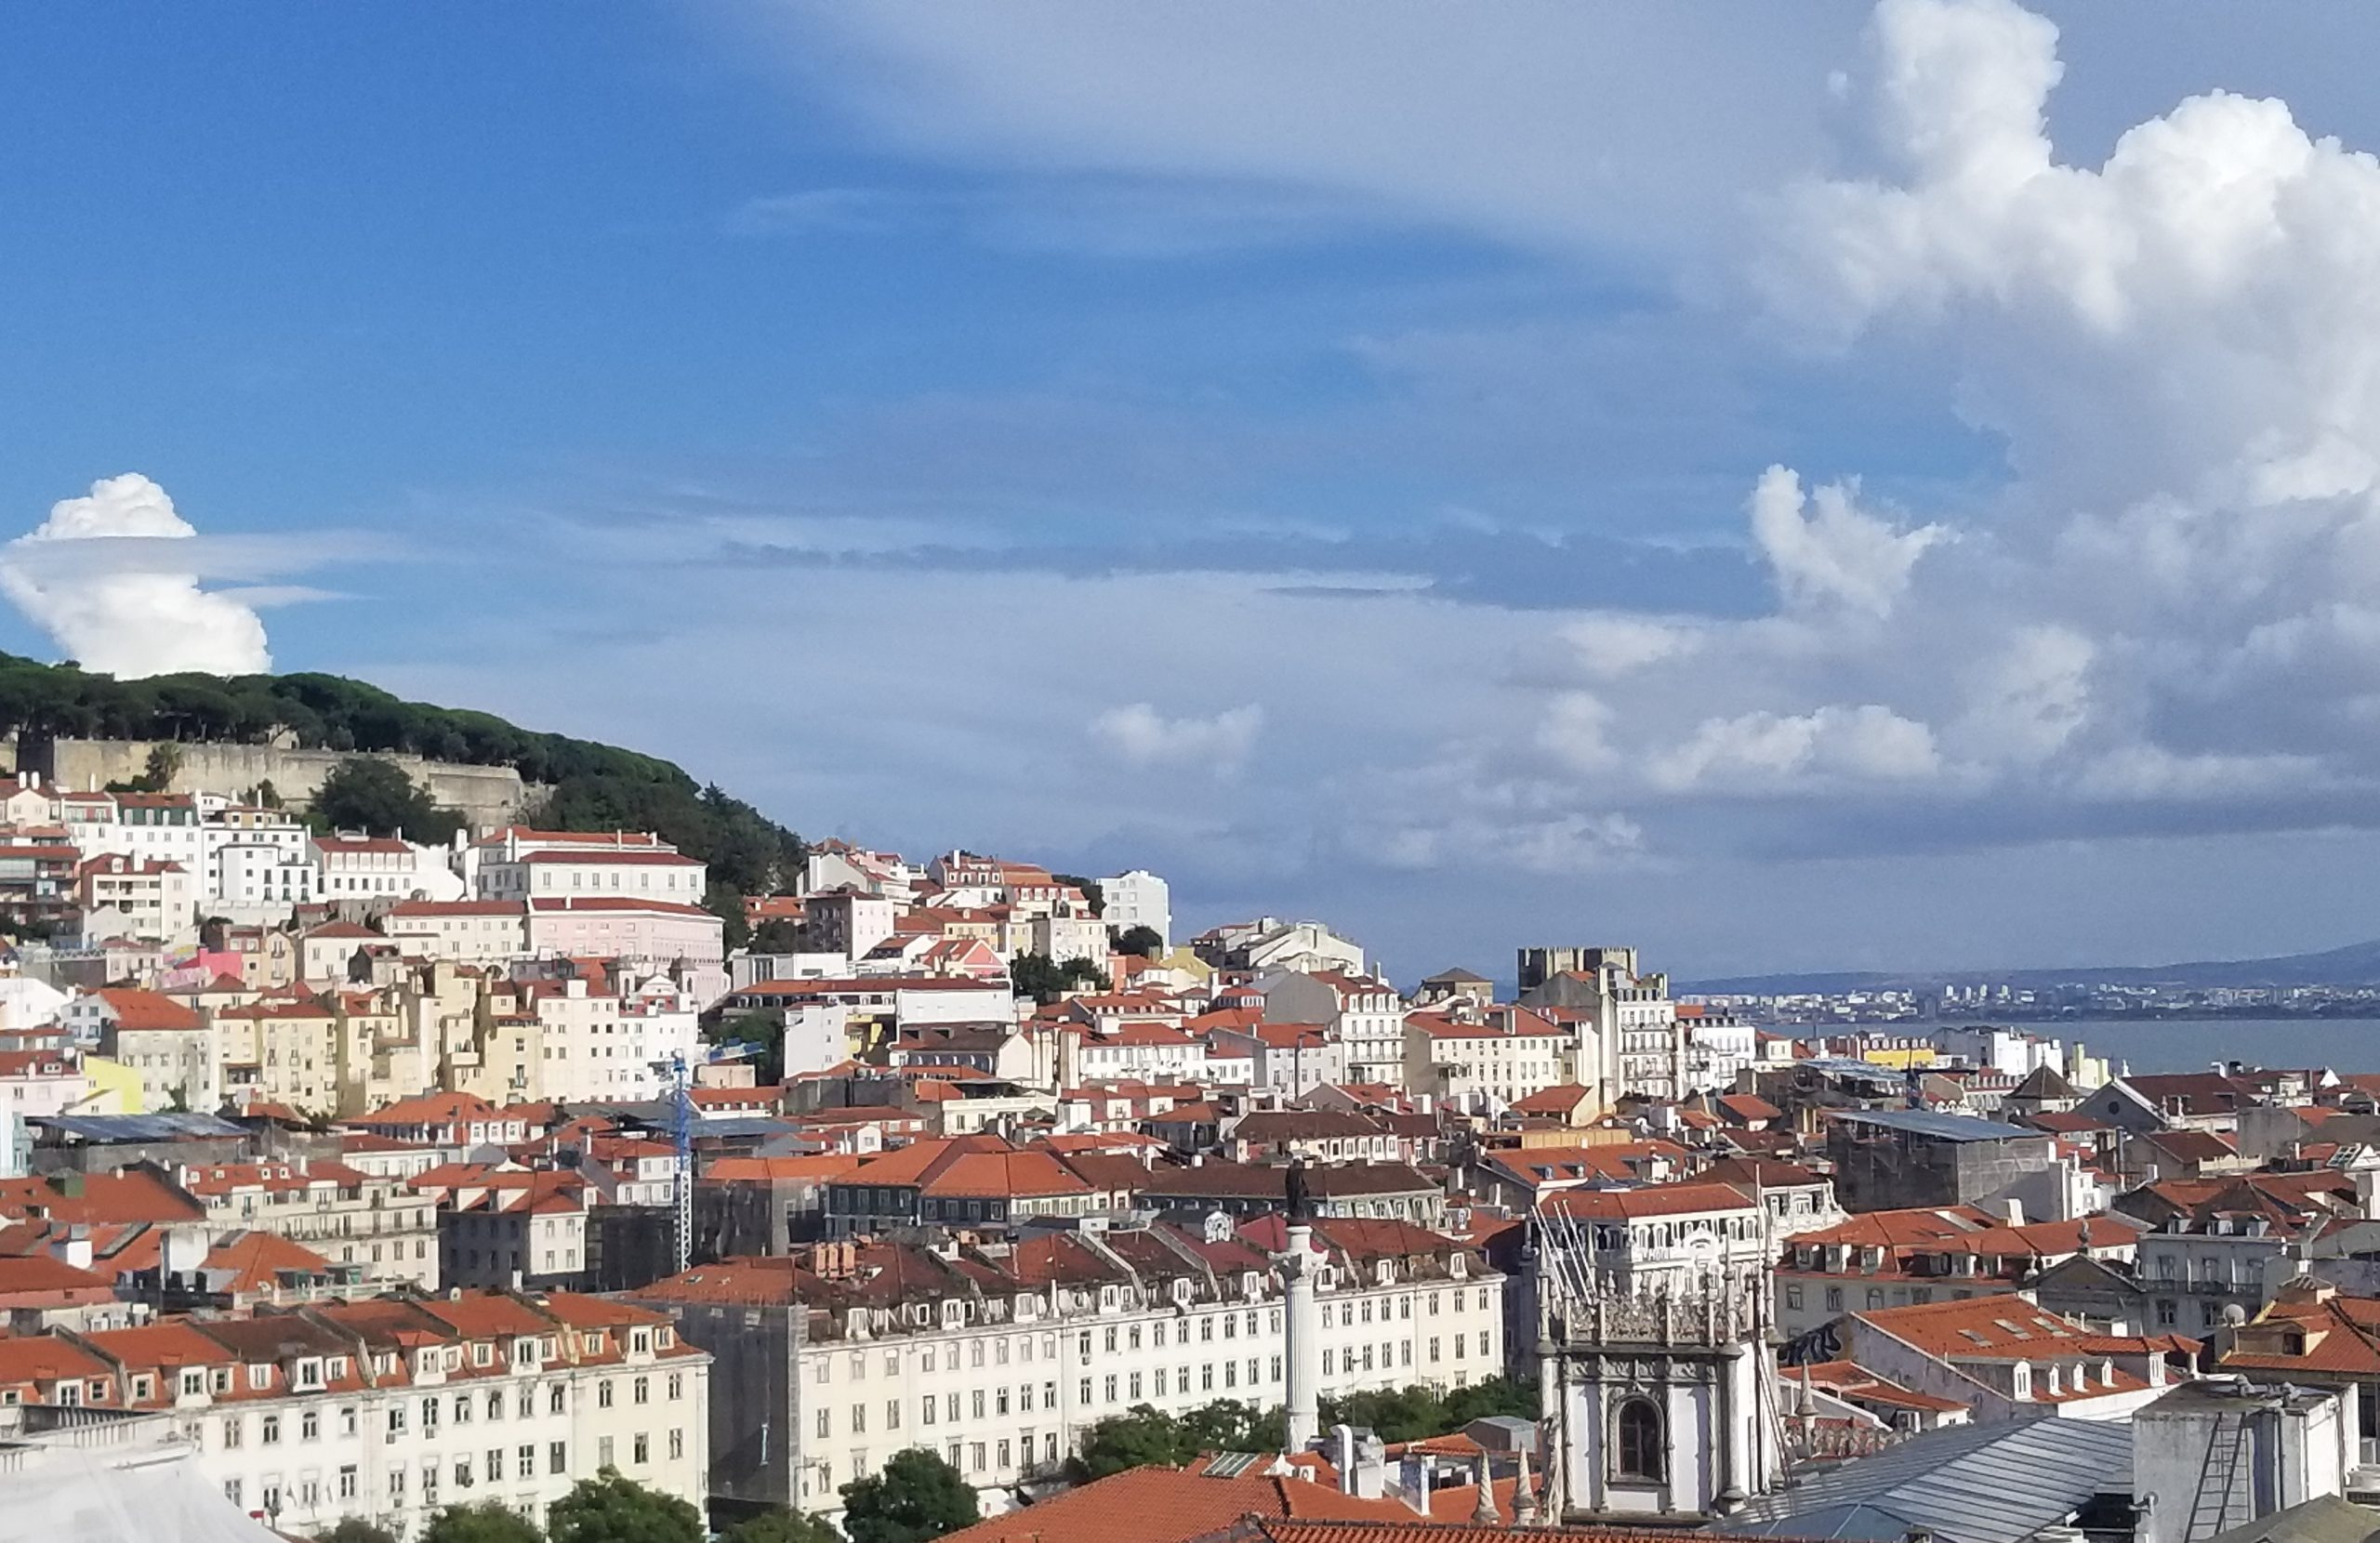 5 Days, 4 Nights in Lisbon